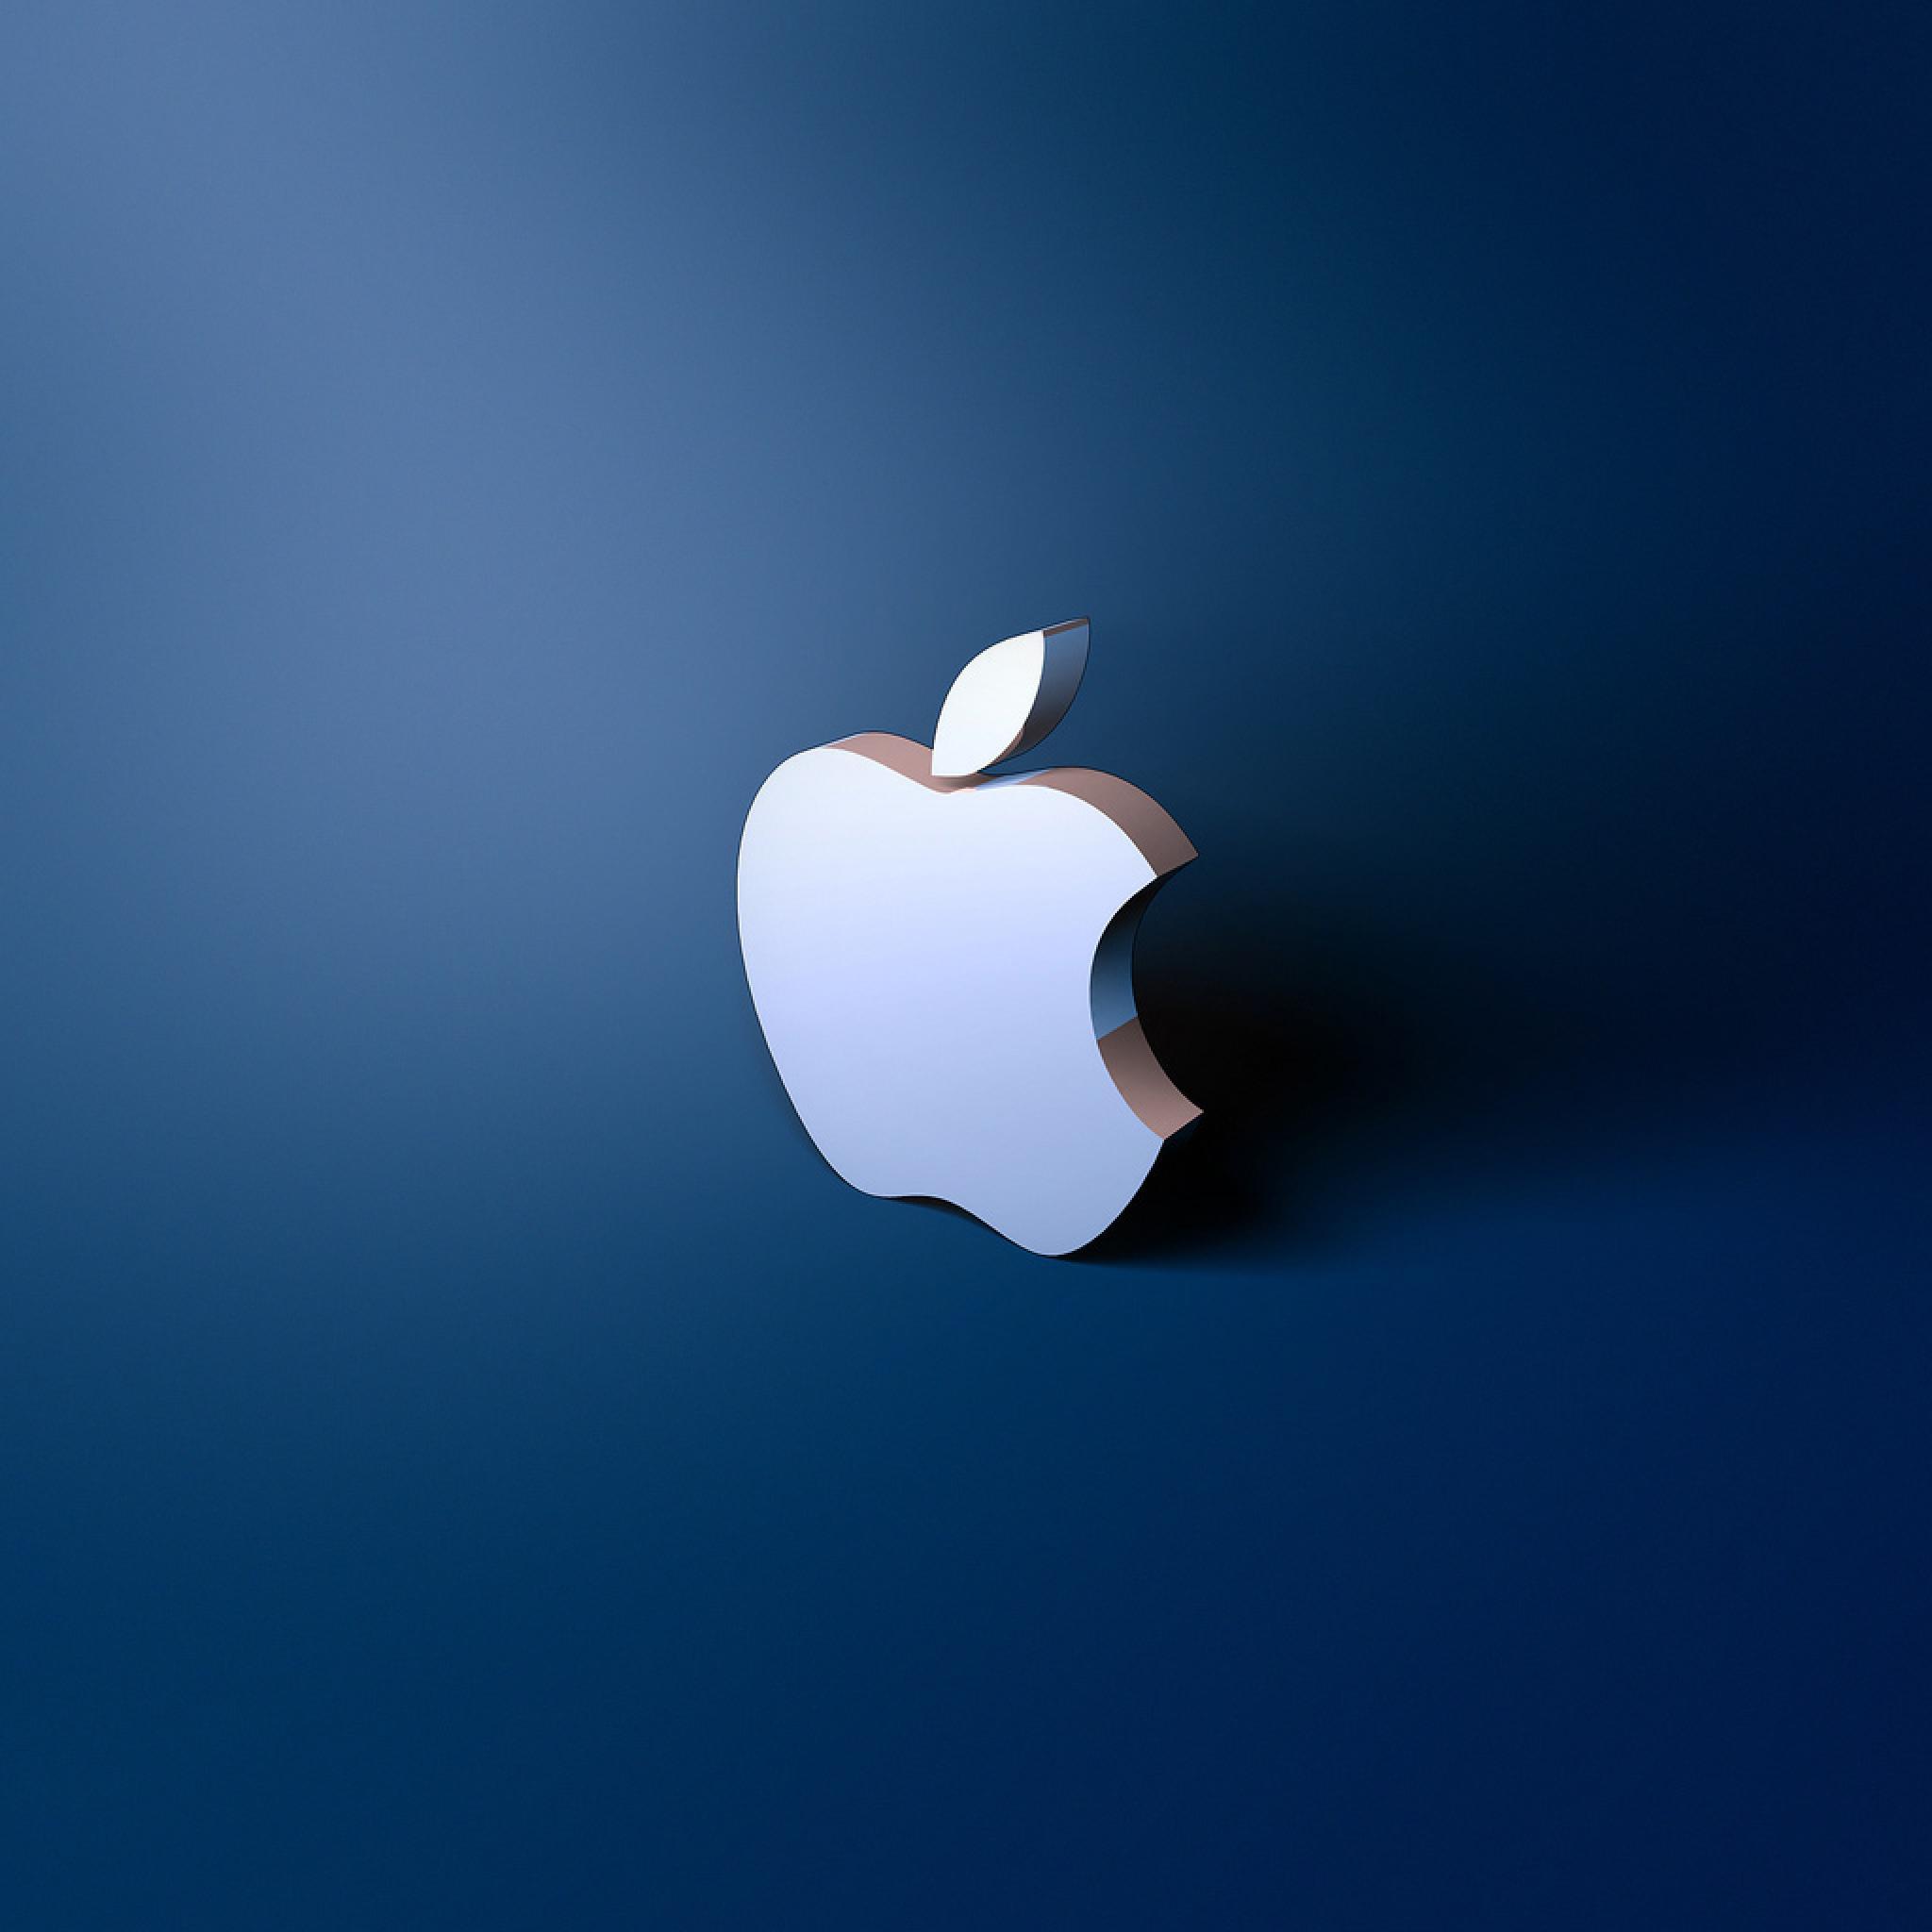 25 257906 apple ipad wallpapers hd apple 3d wallpaper for